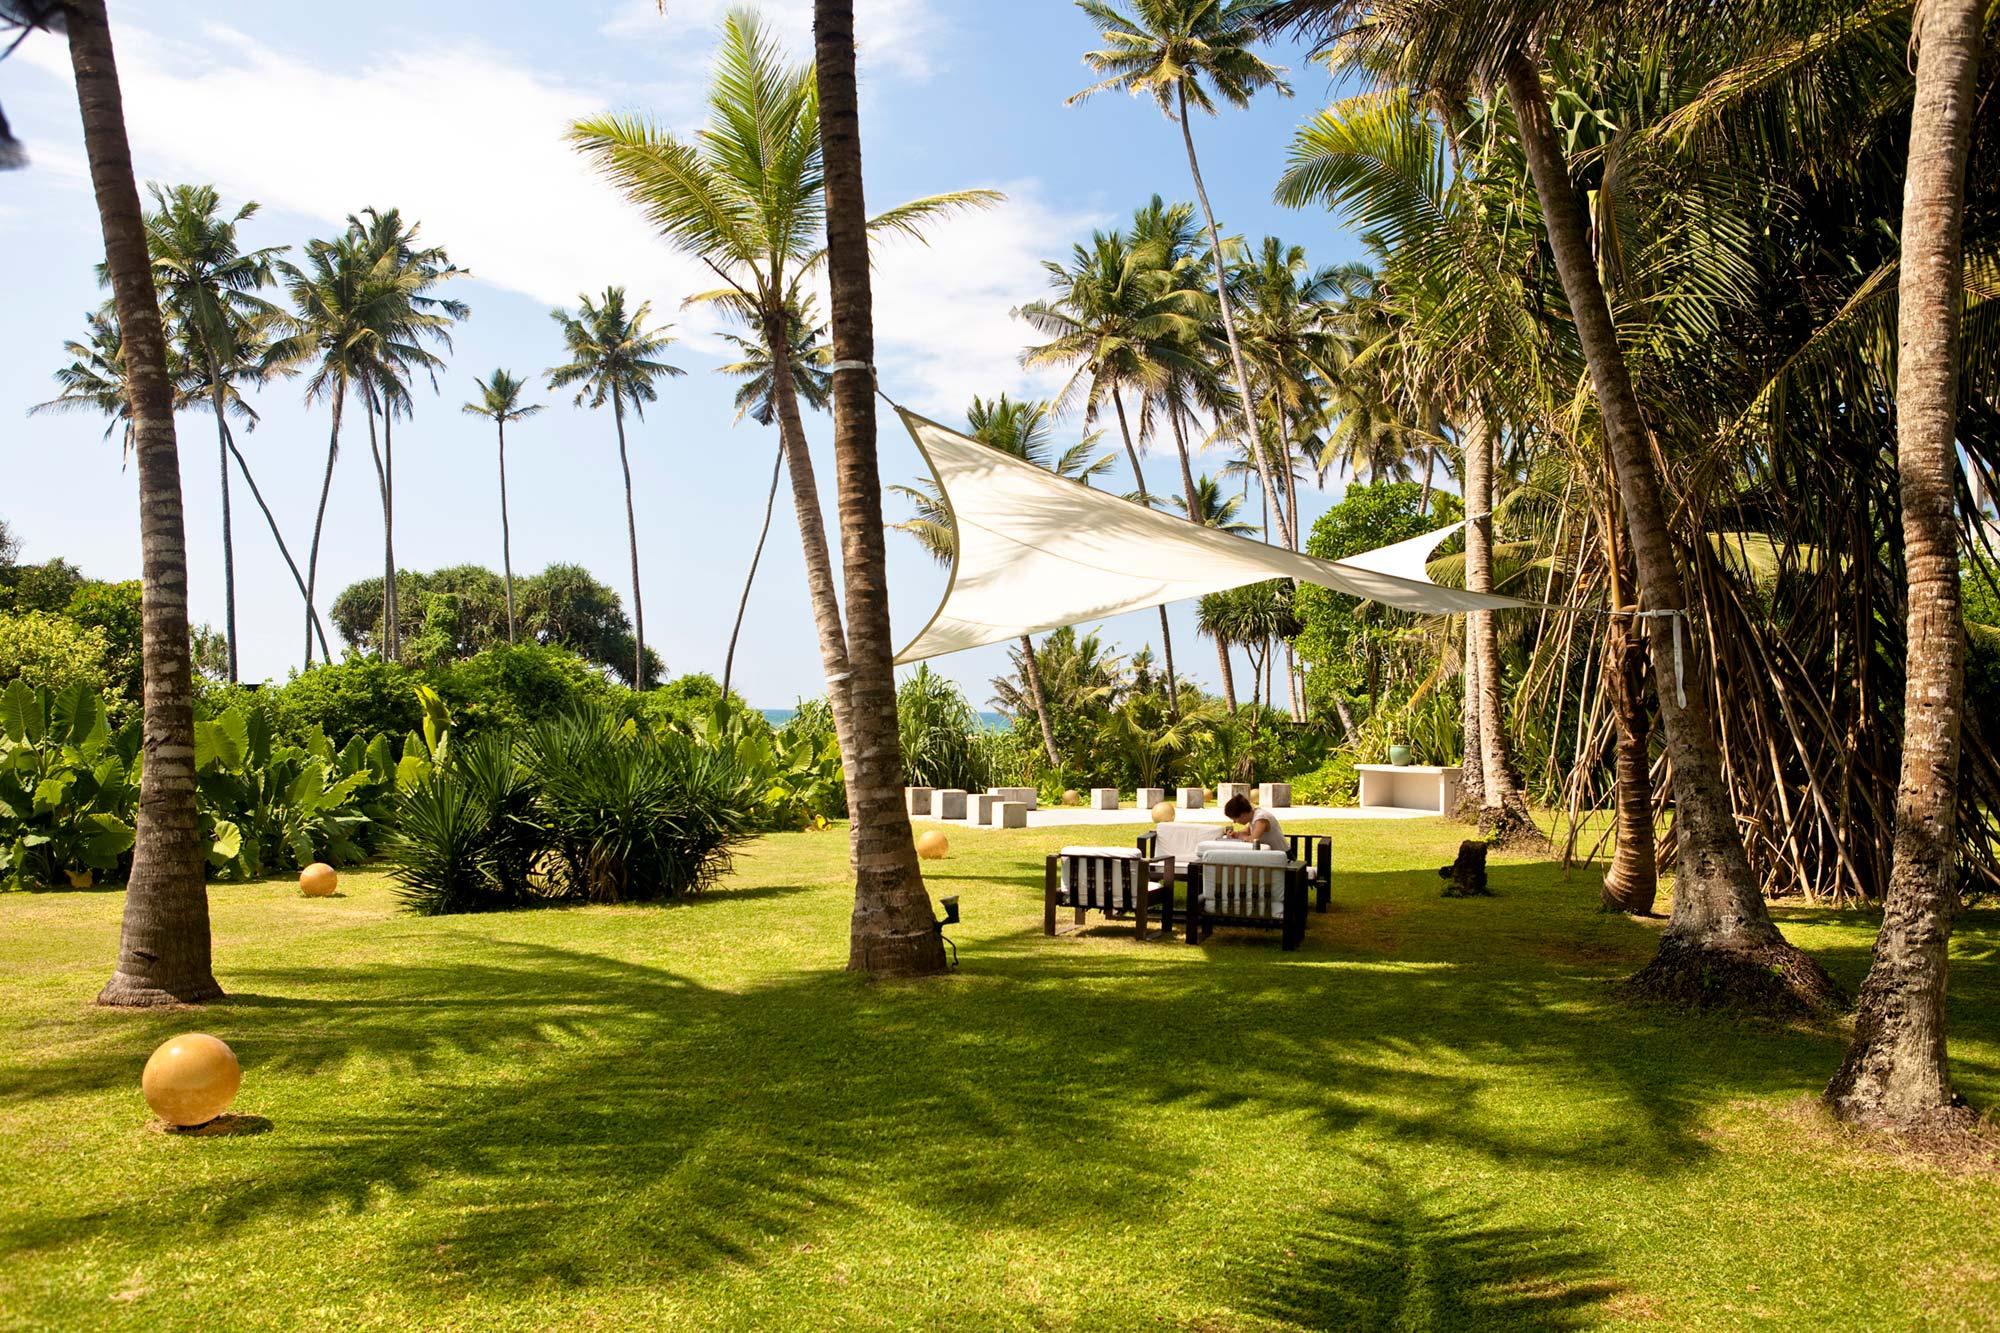 Gartenanlage des Ayurveda Resorts der one world foundation in Ahungalla, Sri Lanka, Foto: Thomas Wirthensohn